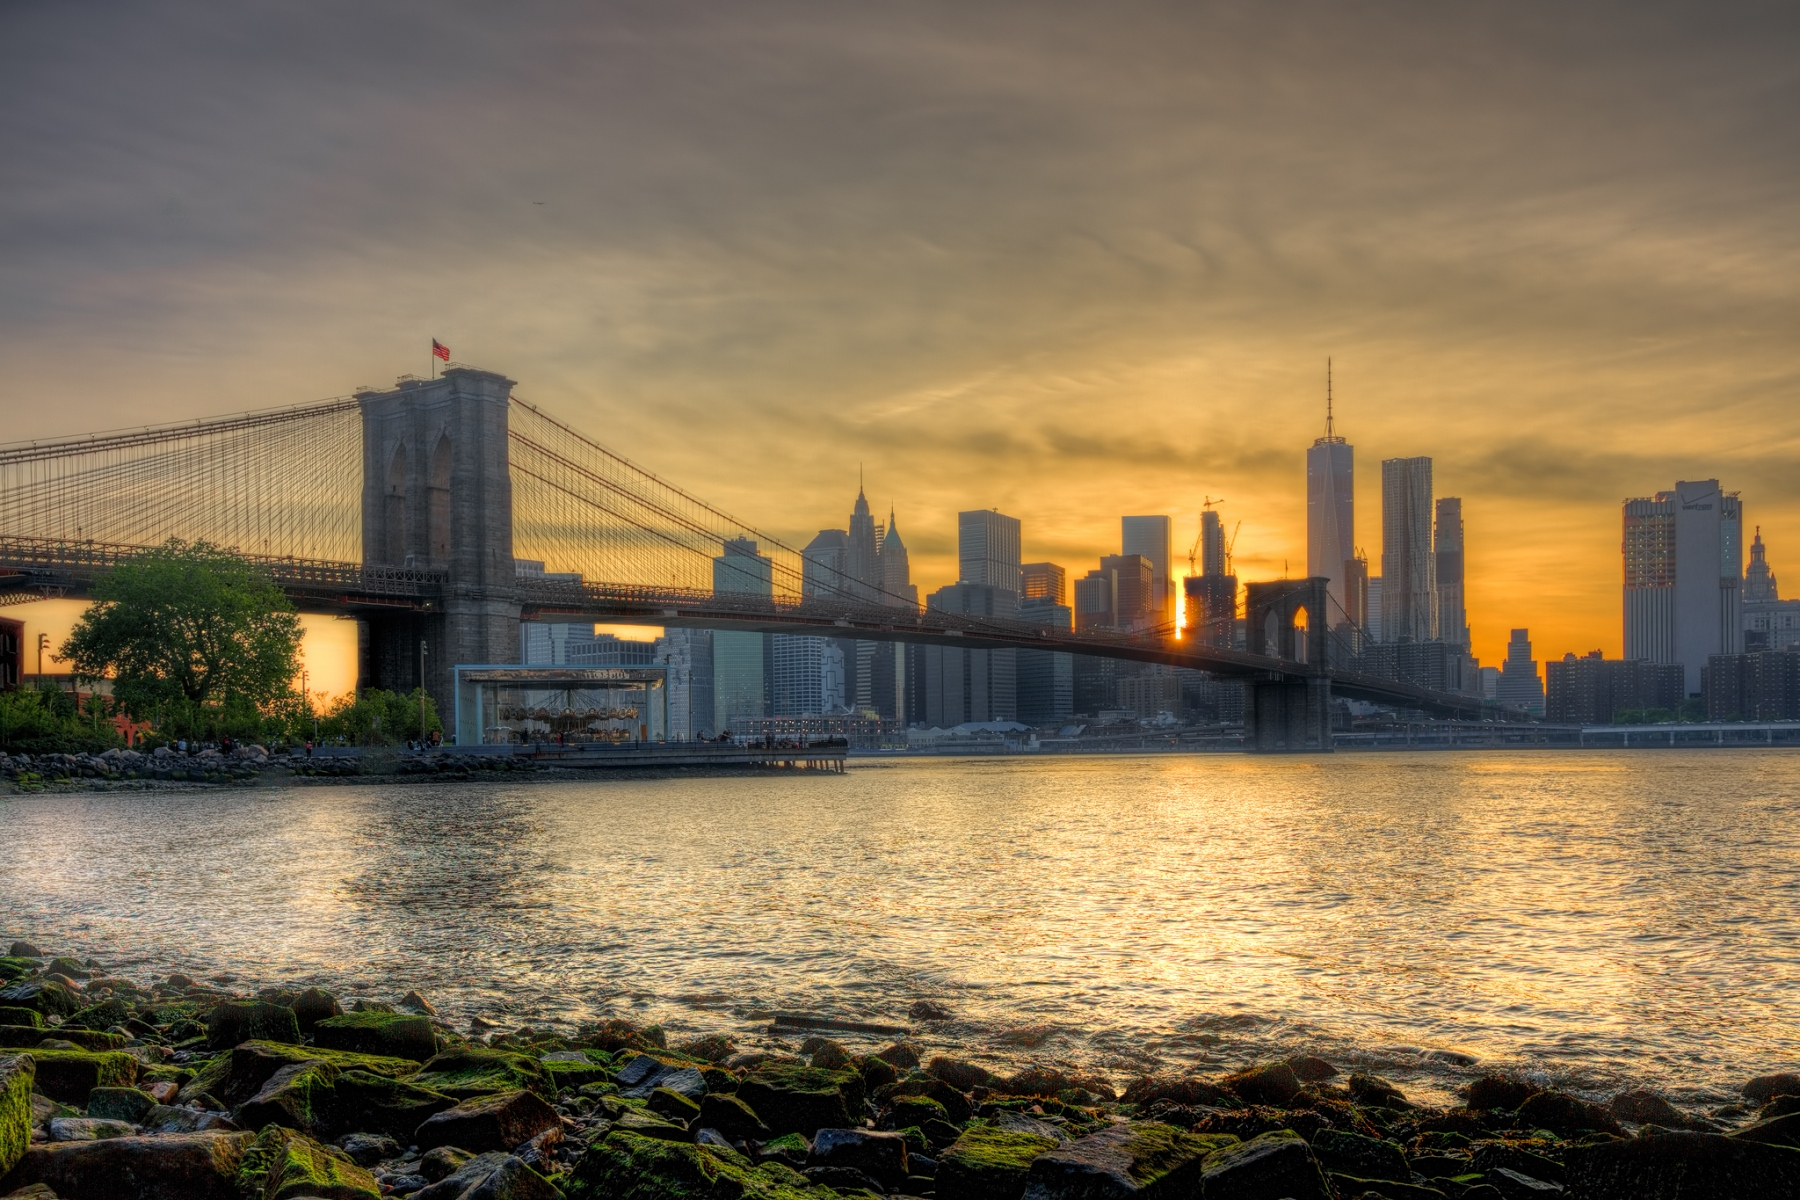 20160512_BrooklynBridge-39_40_41_42_43_44_45_tonemapped_web